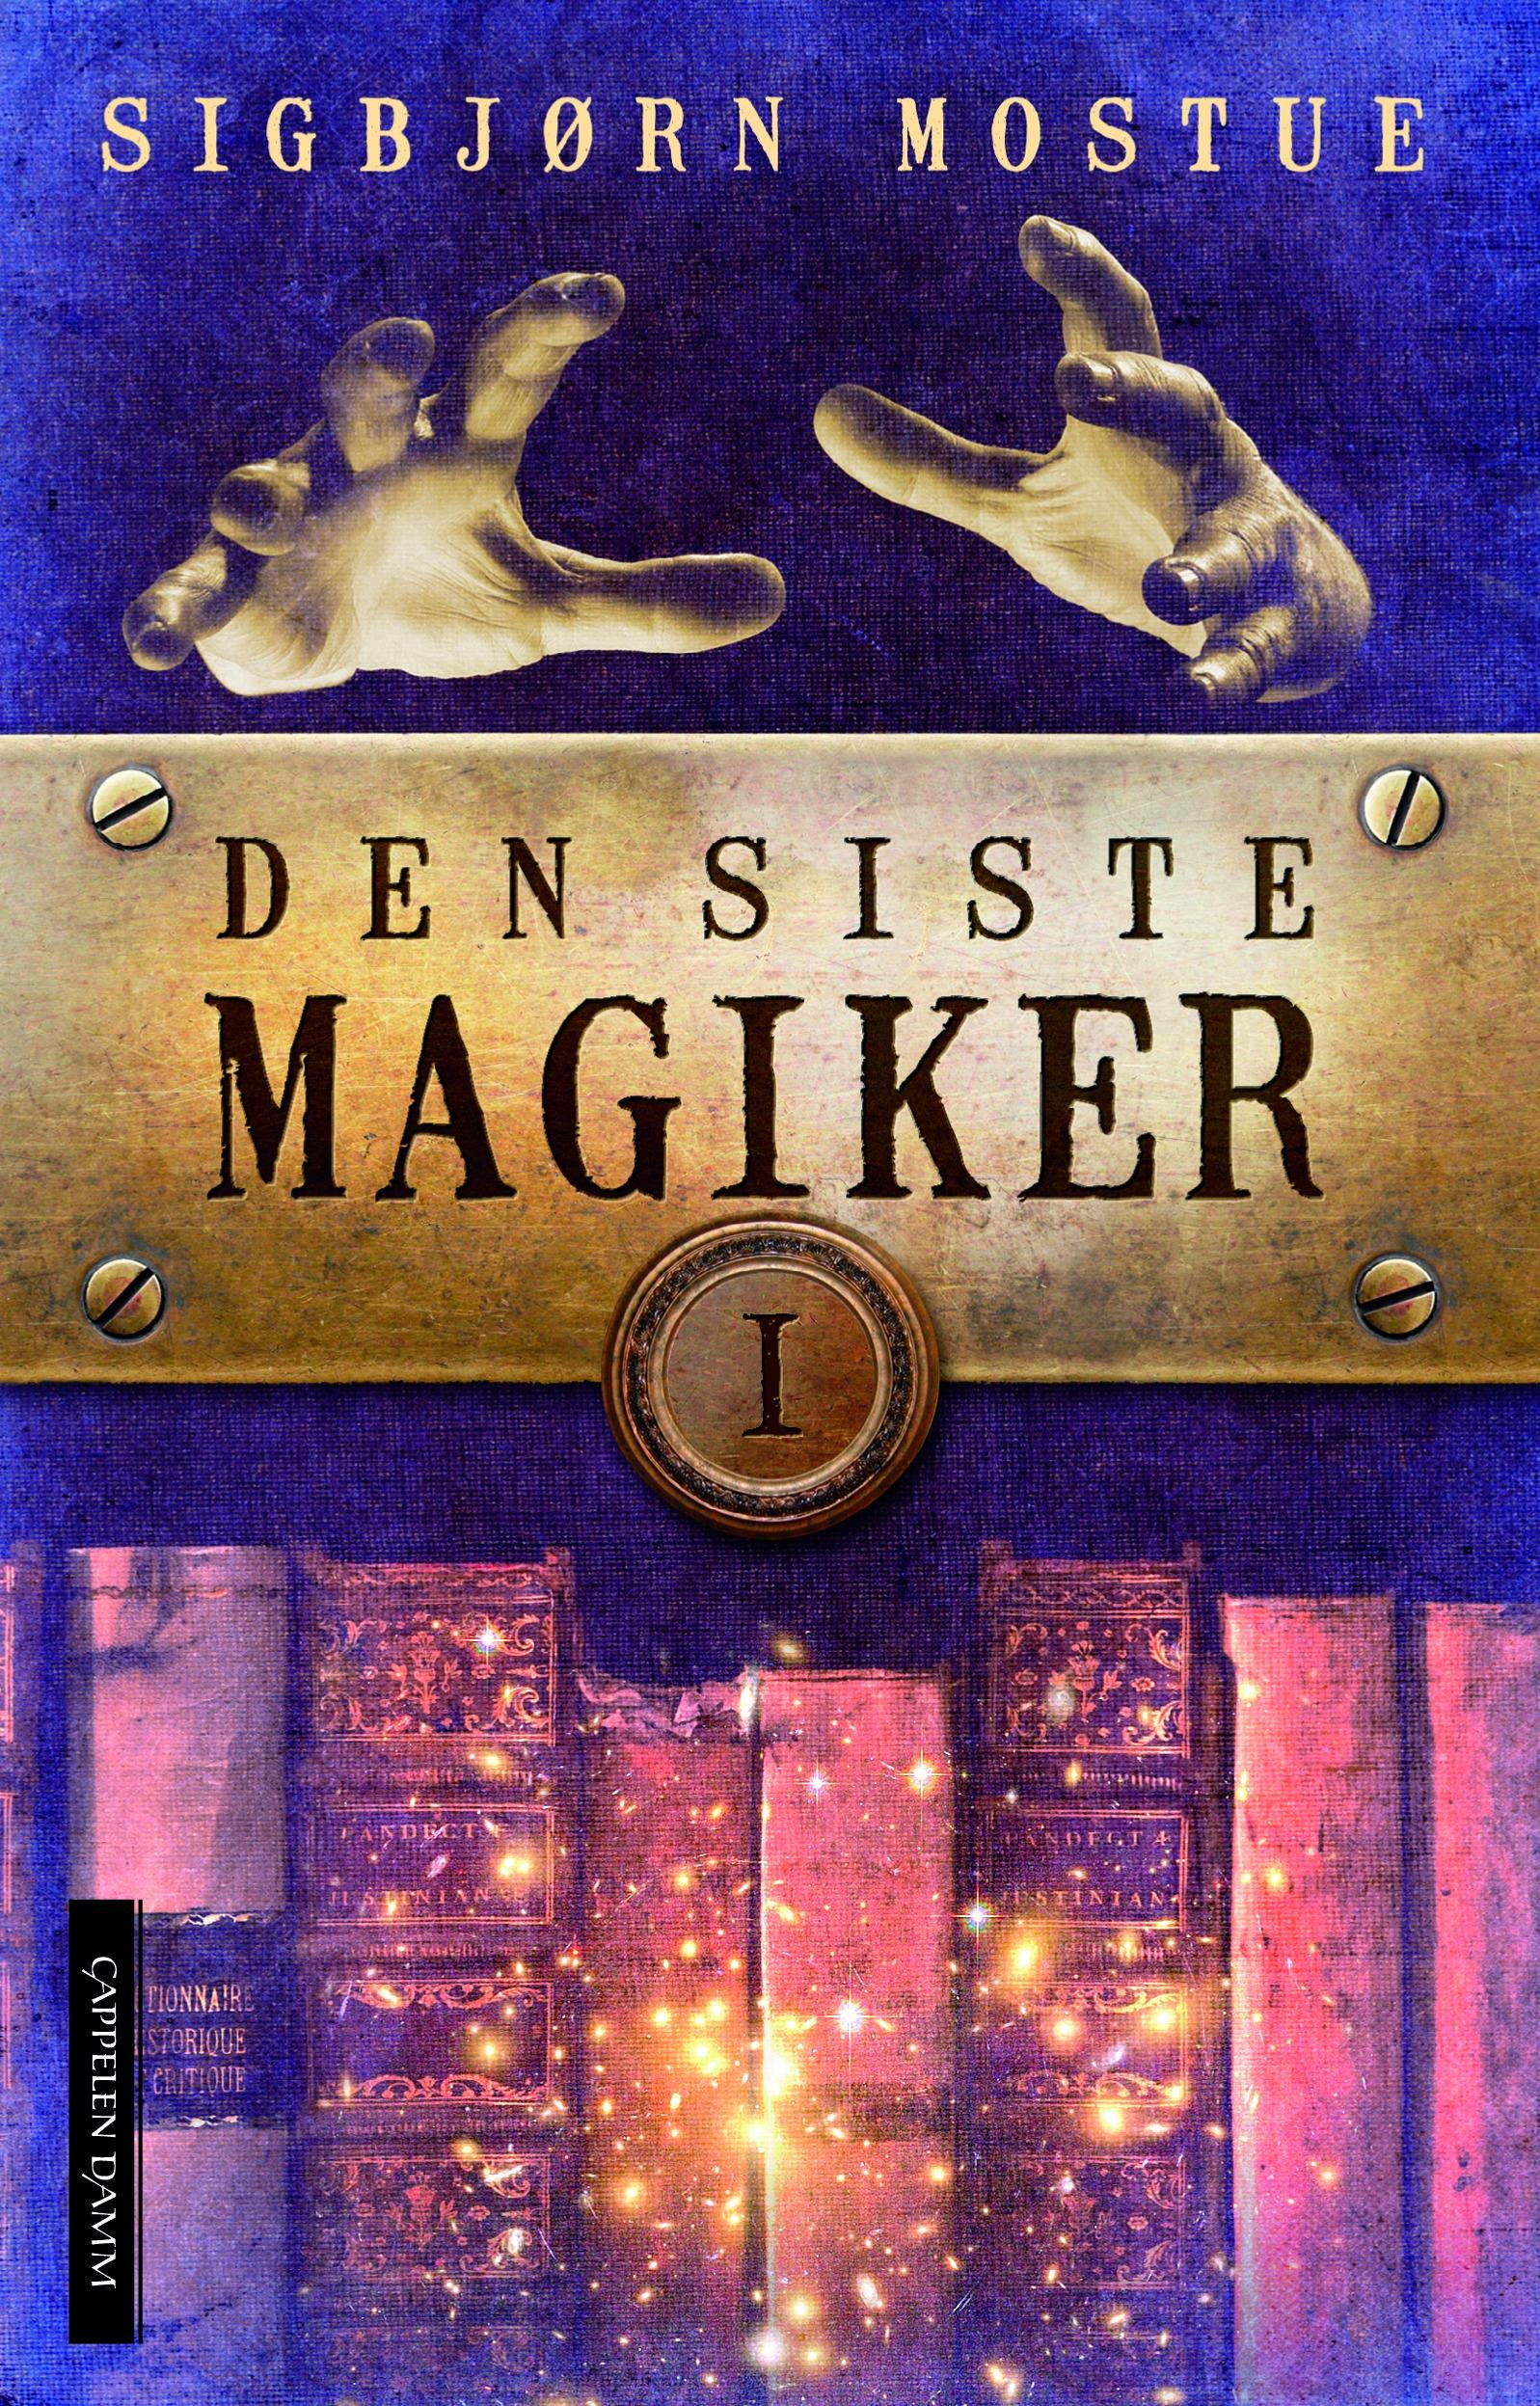 """Den siste magiker I"" av Sigbjørn Mostue"